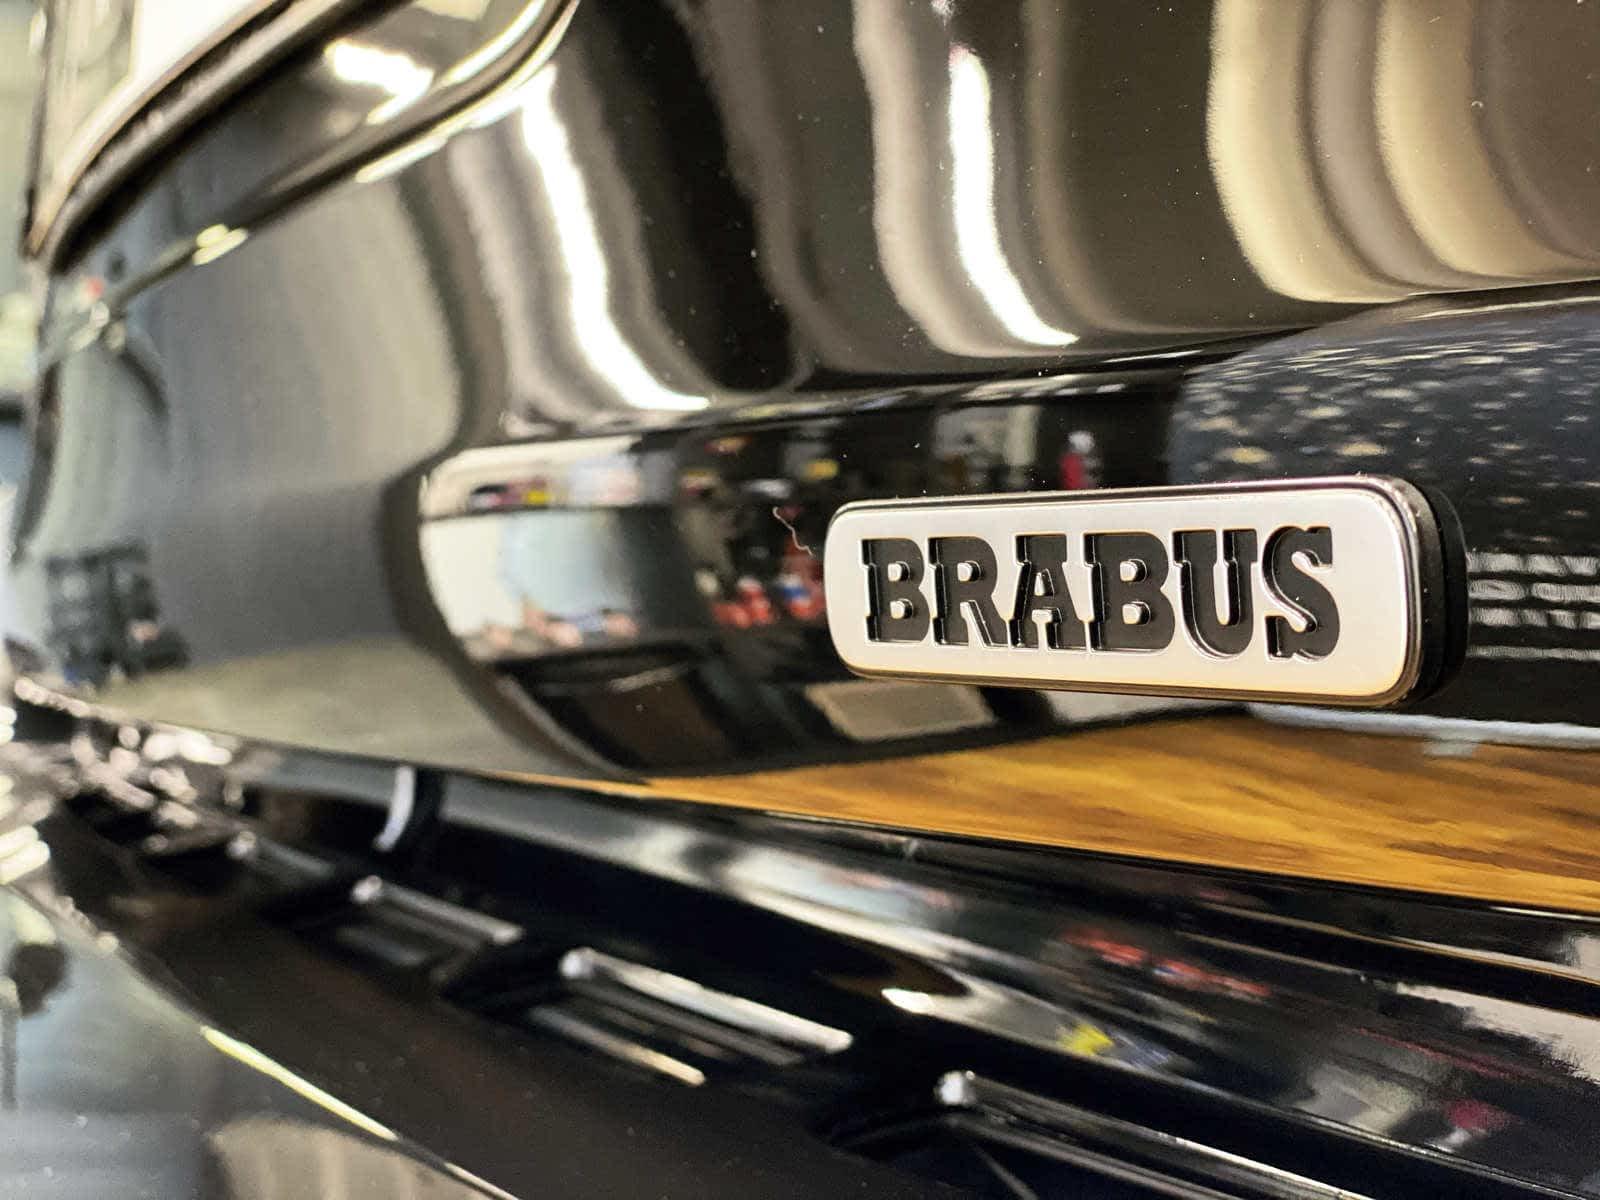 Smart Brabus - jednoetapowa korekta i usuwanie wgniotek 1